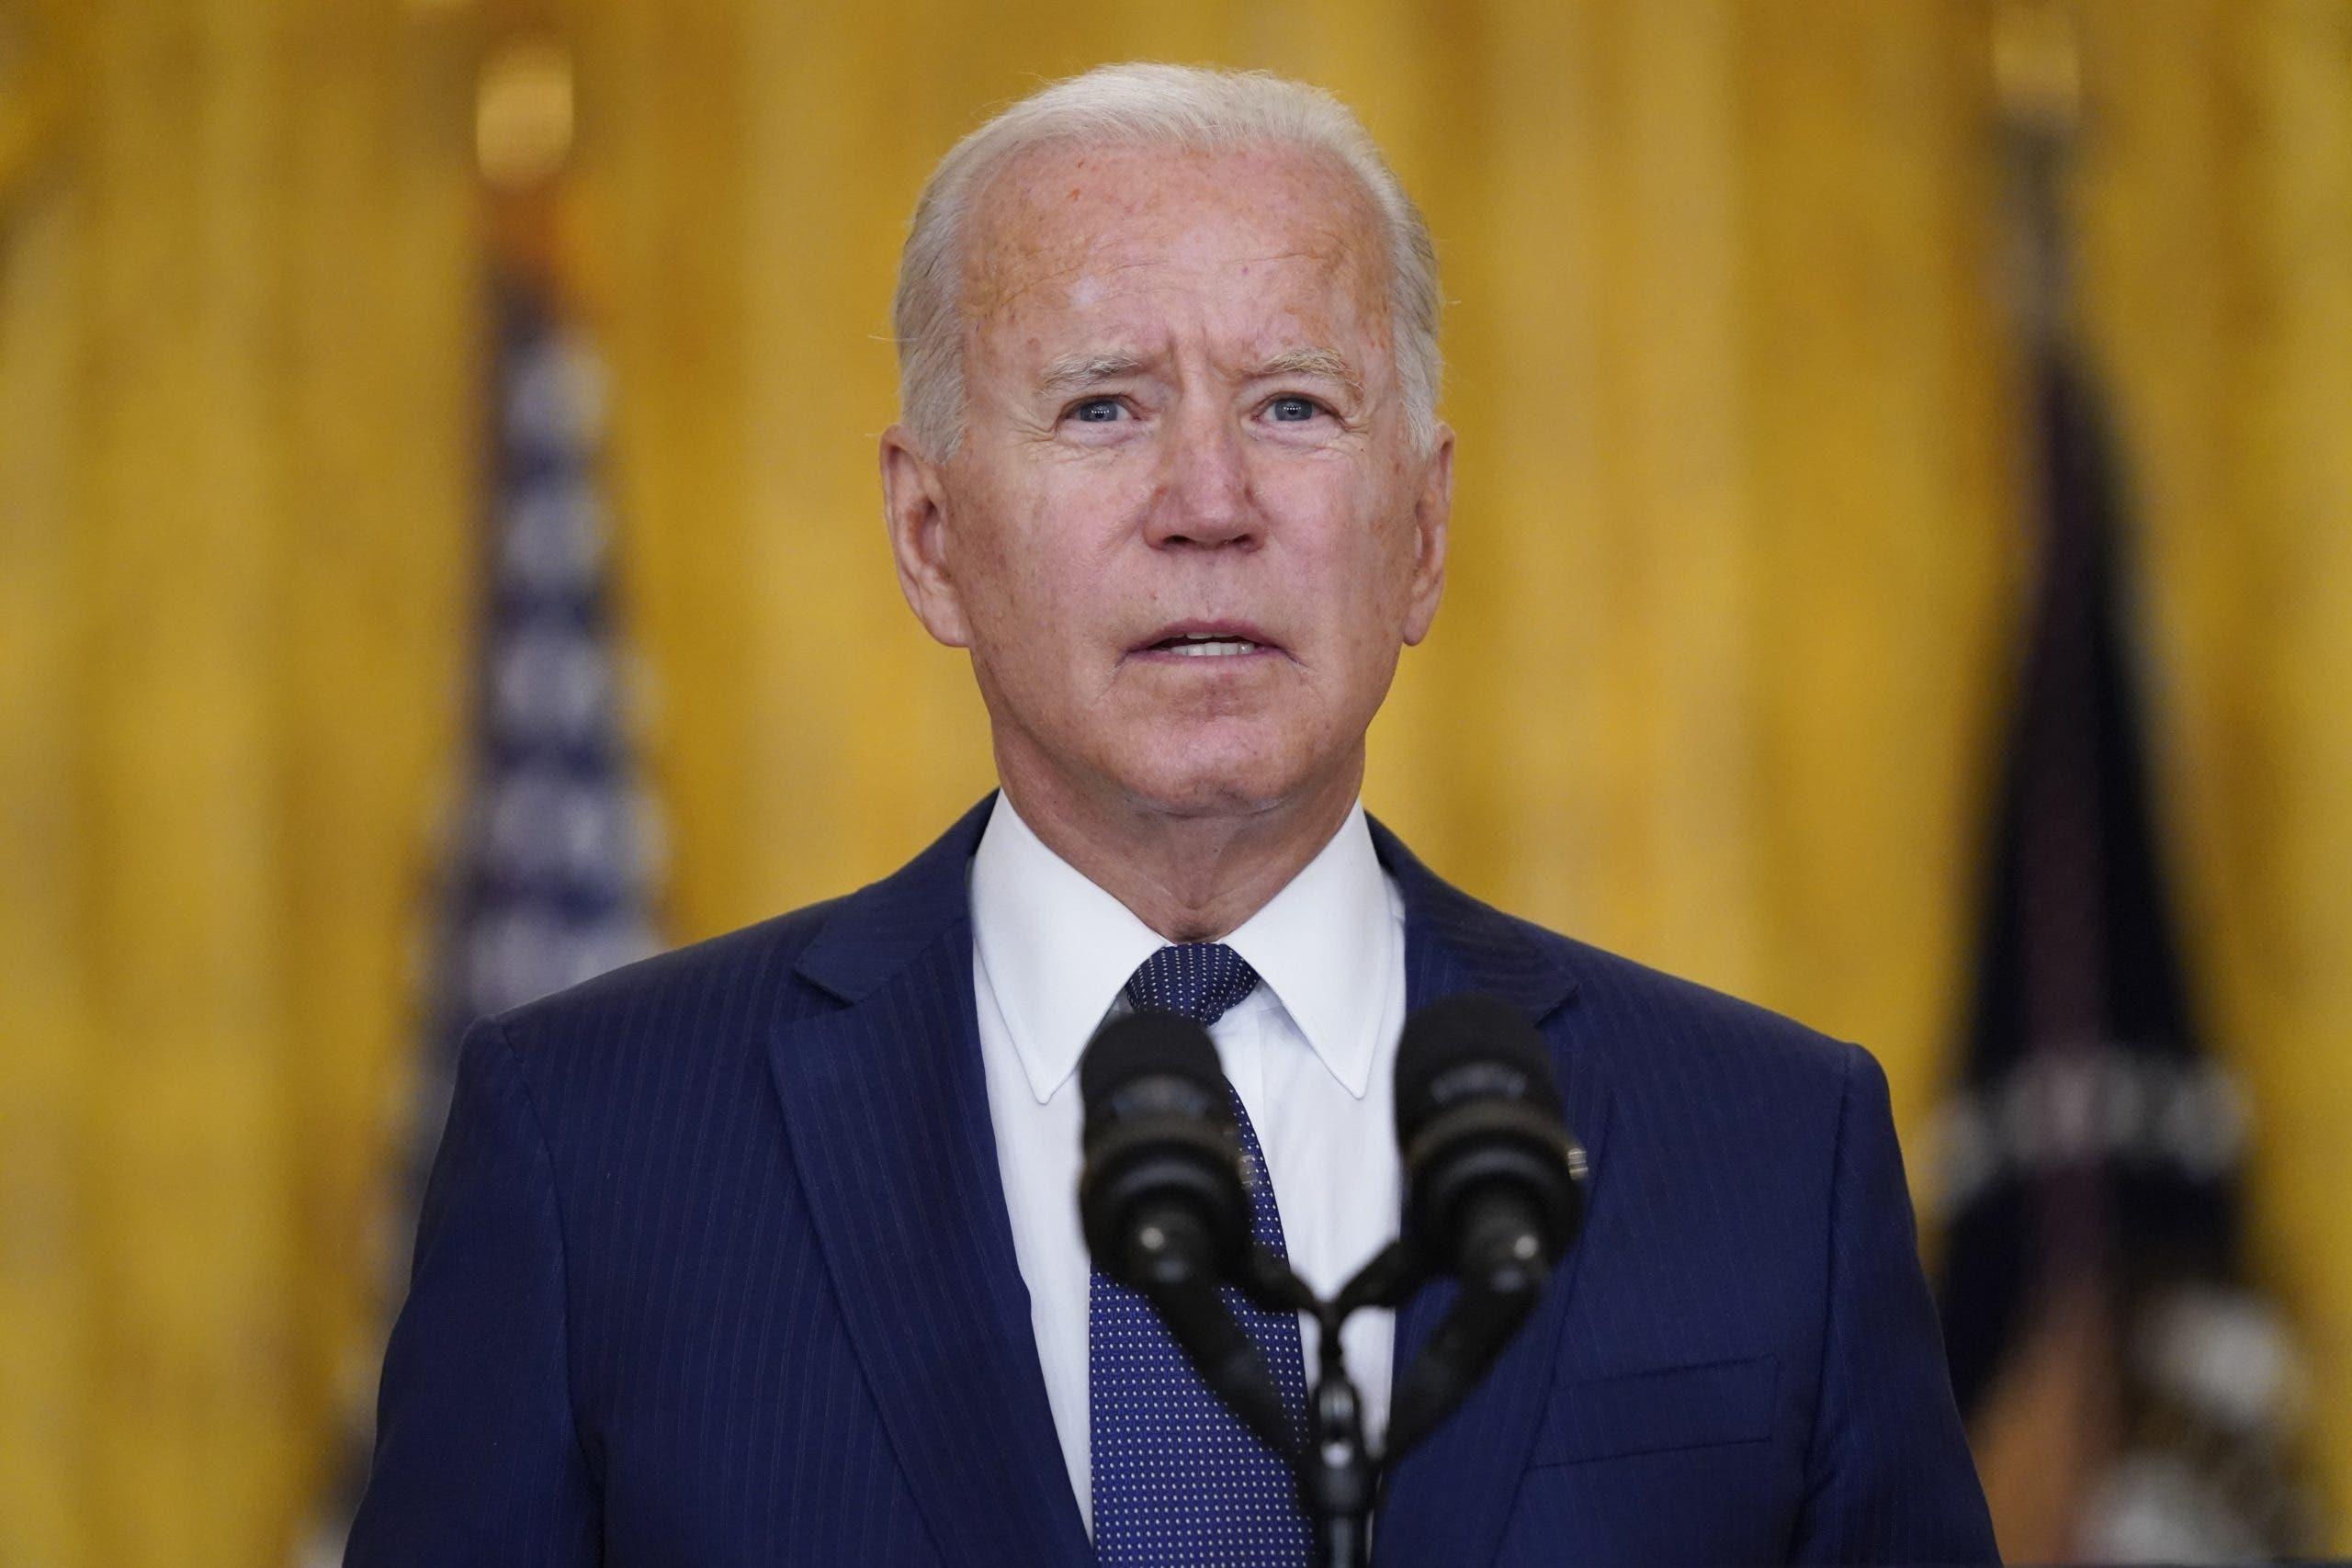 Biden a punto de desclasificar documentos sobre el 11-S